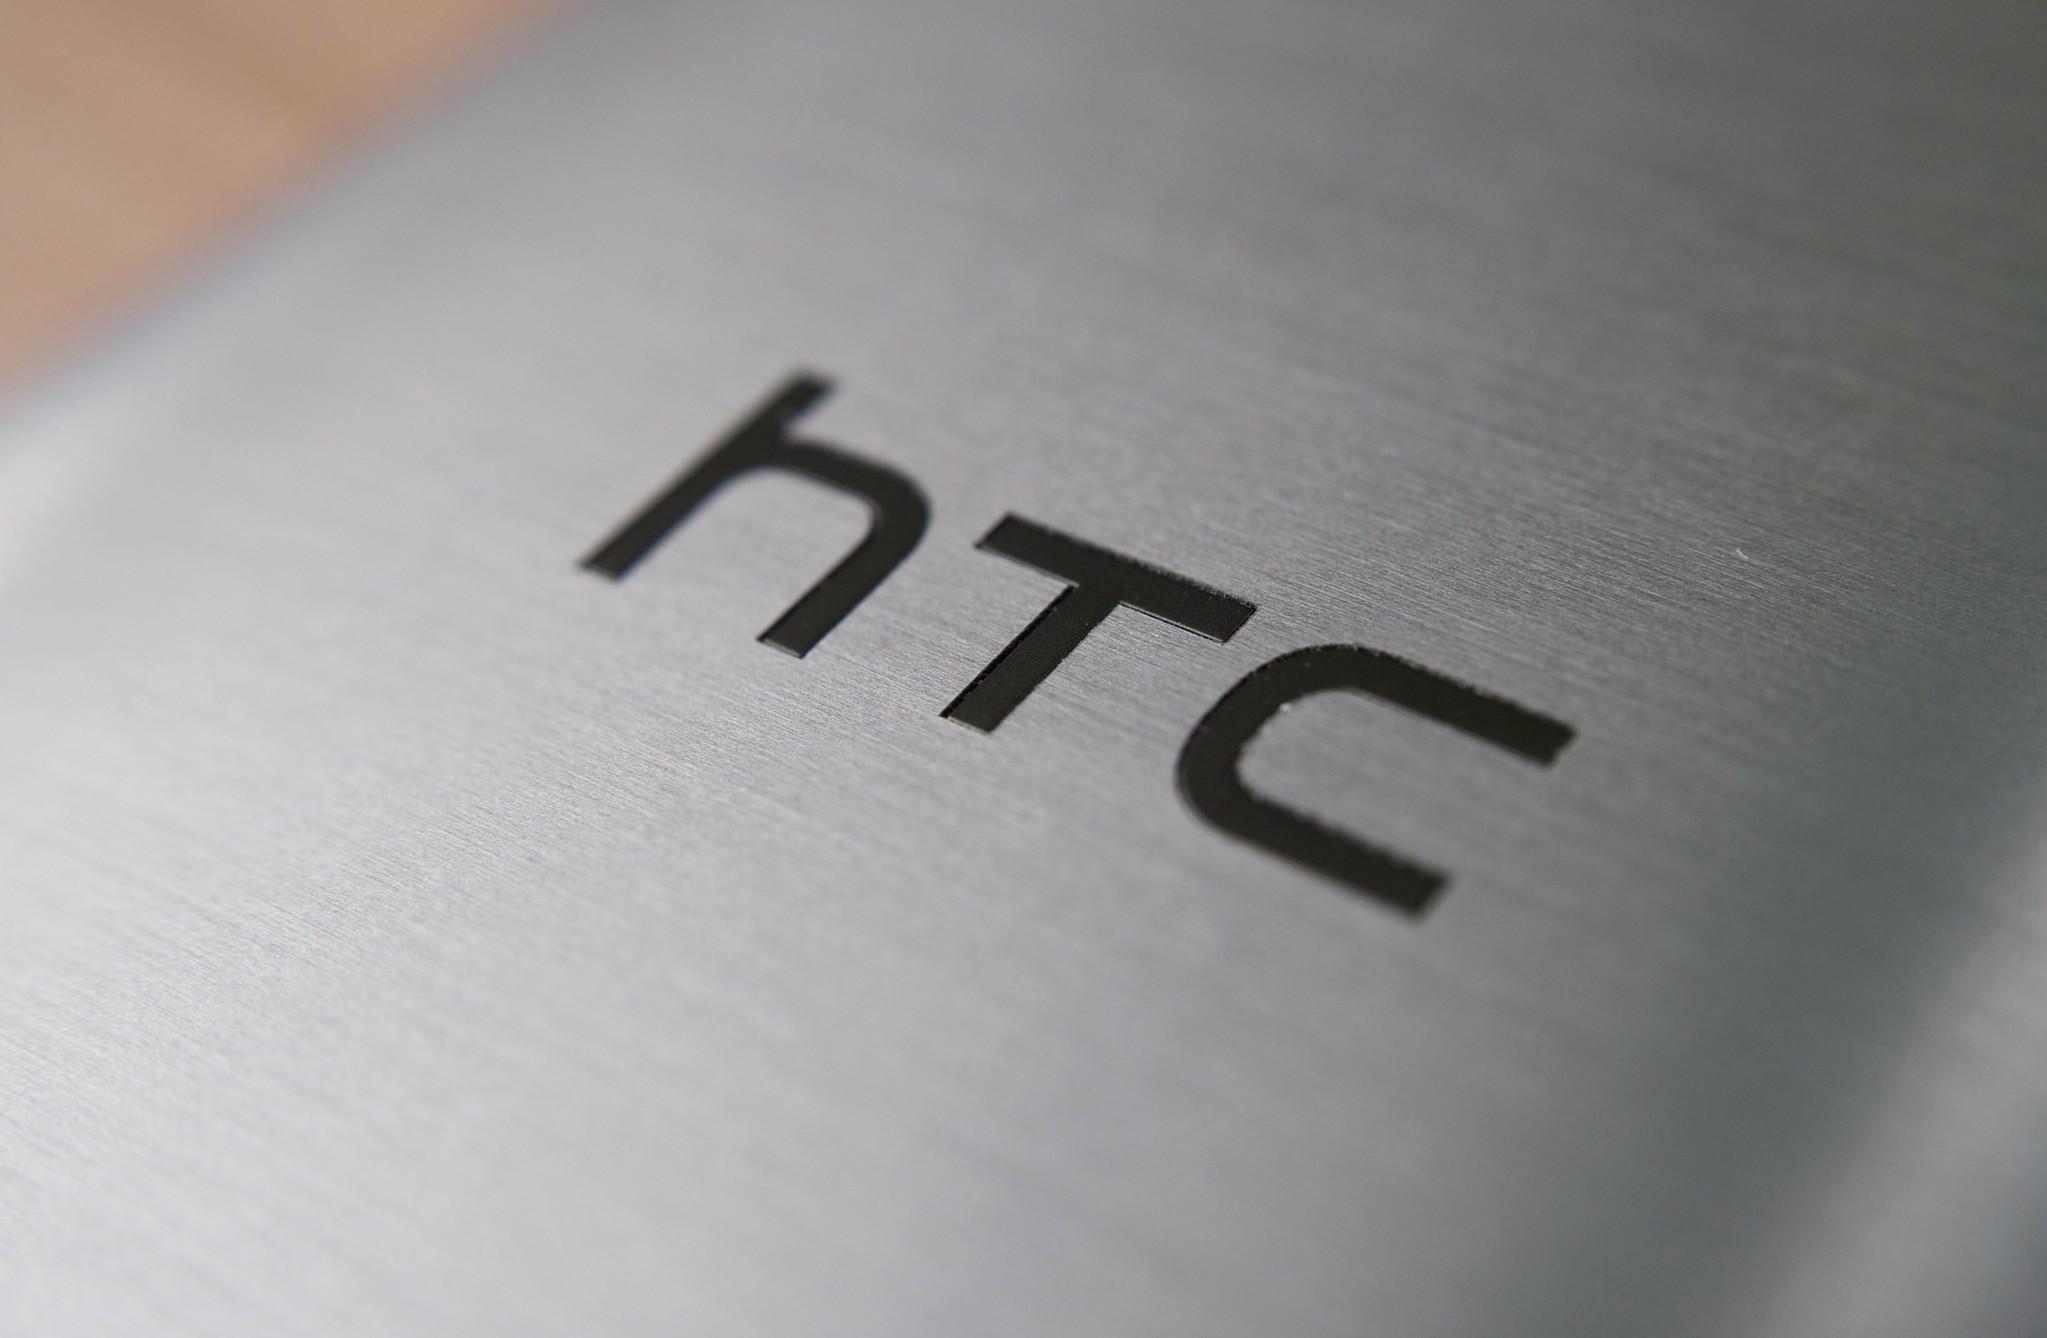 Обзор смартфона HTC Wildfire R70 с основными характеристиками